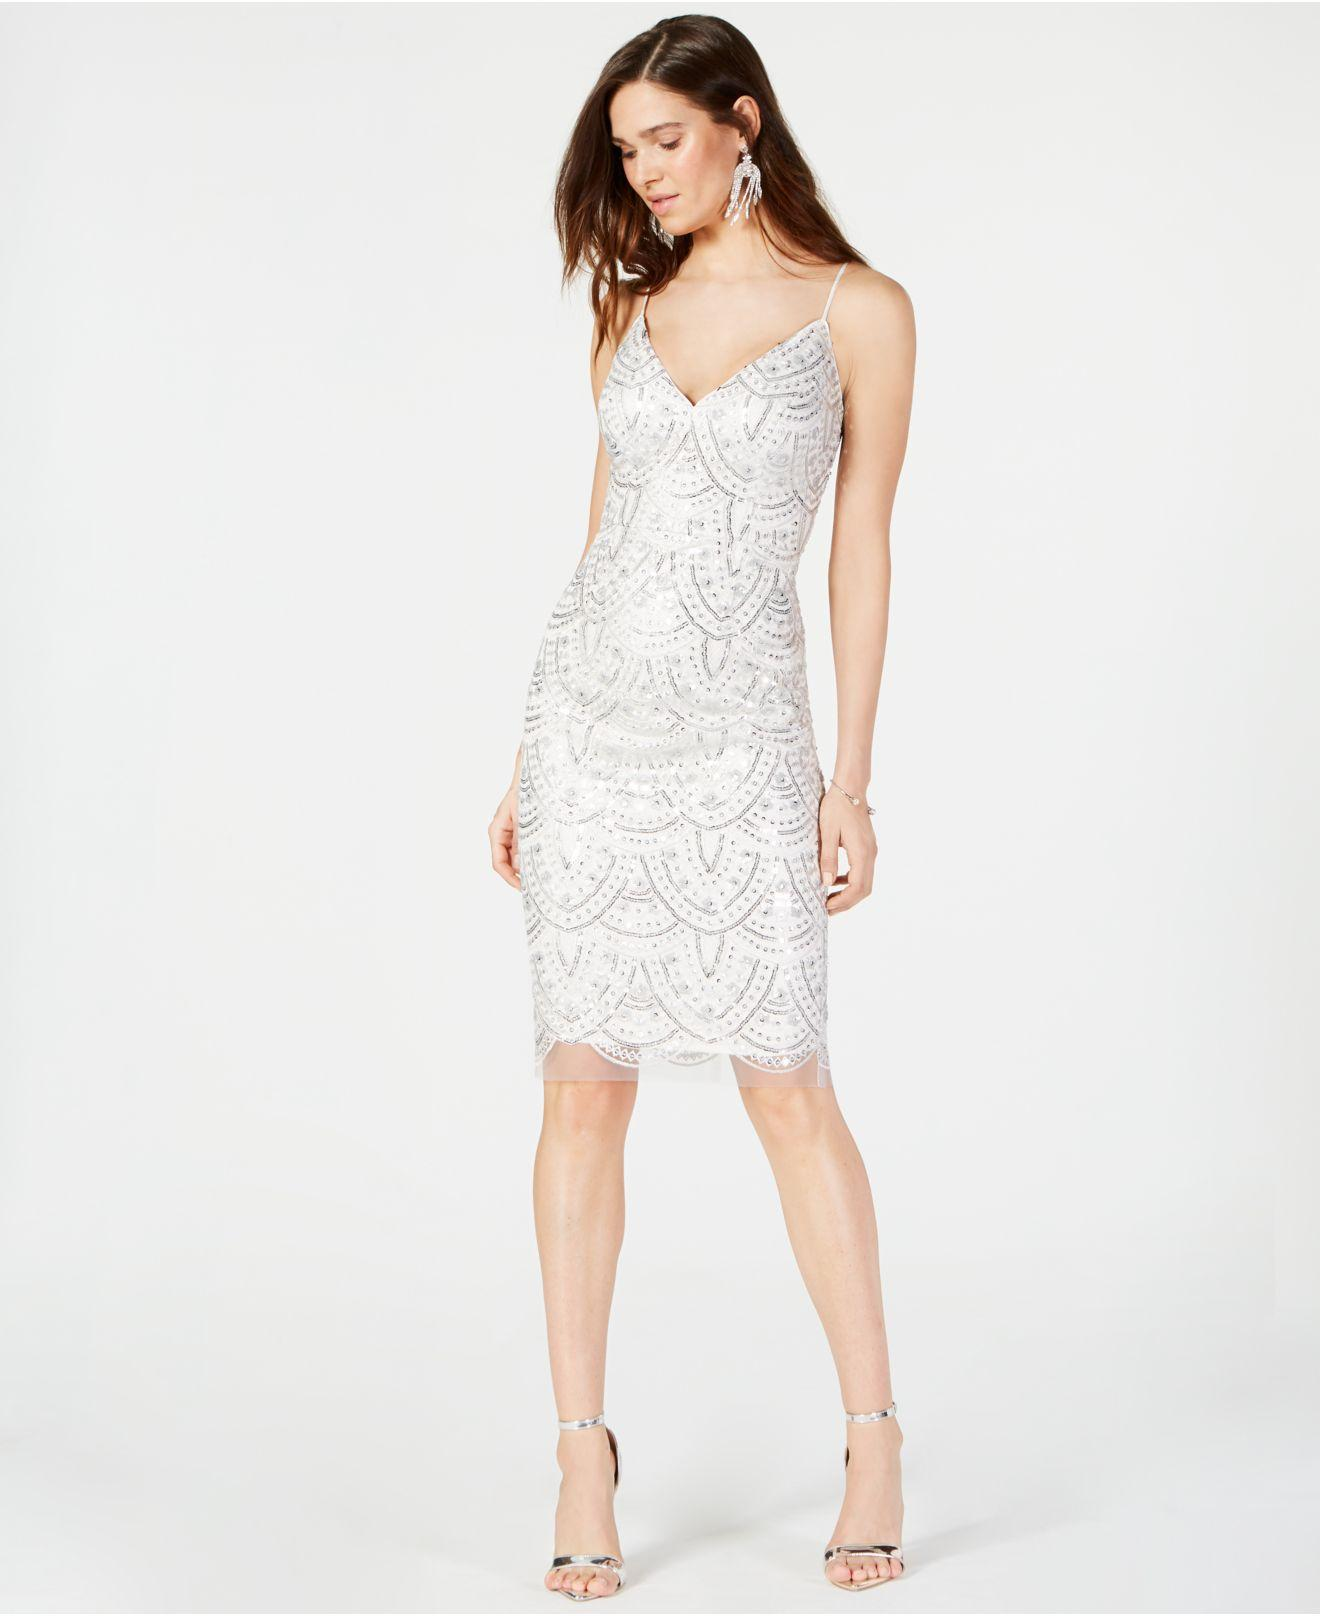 7f3fde73b Sequin Cocktail Dresses Macys